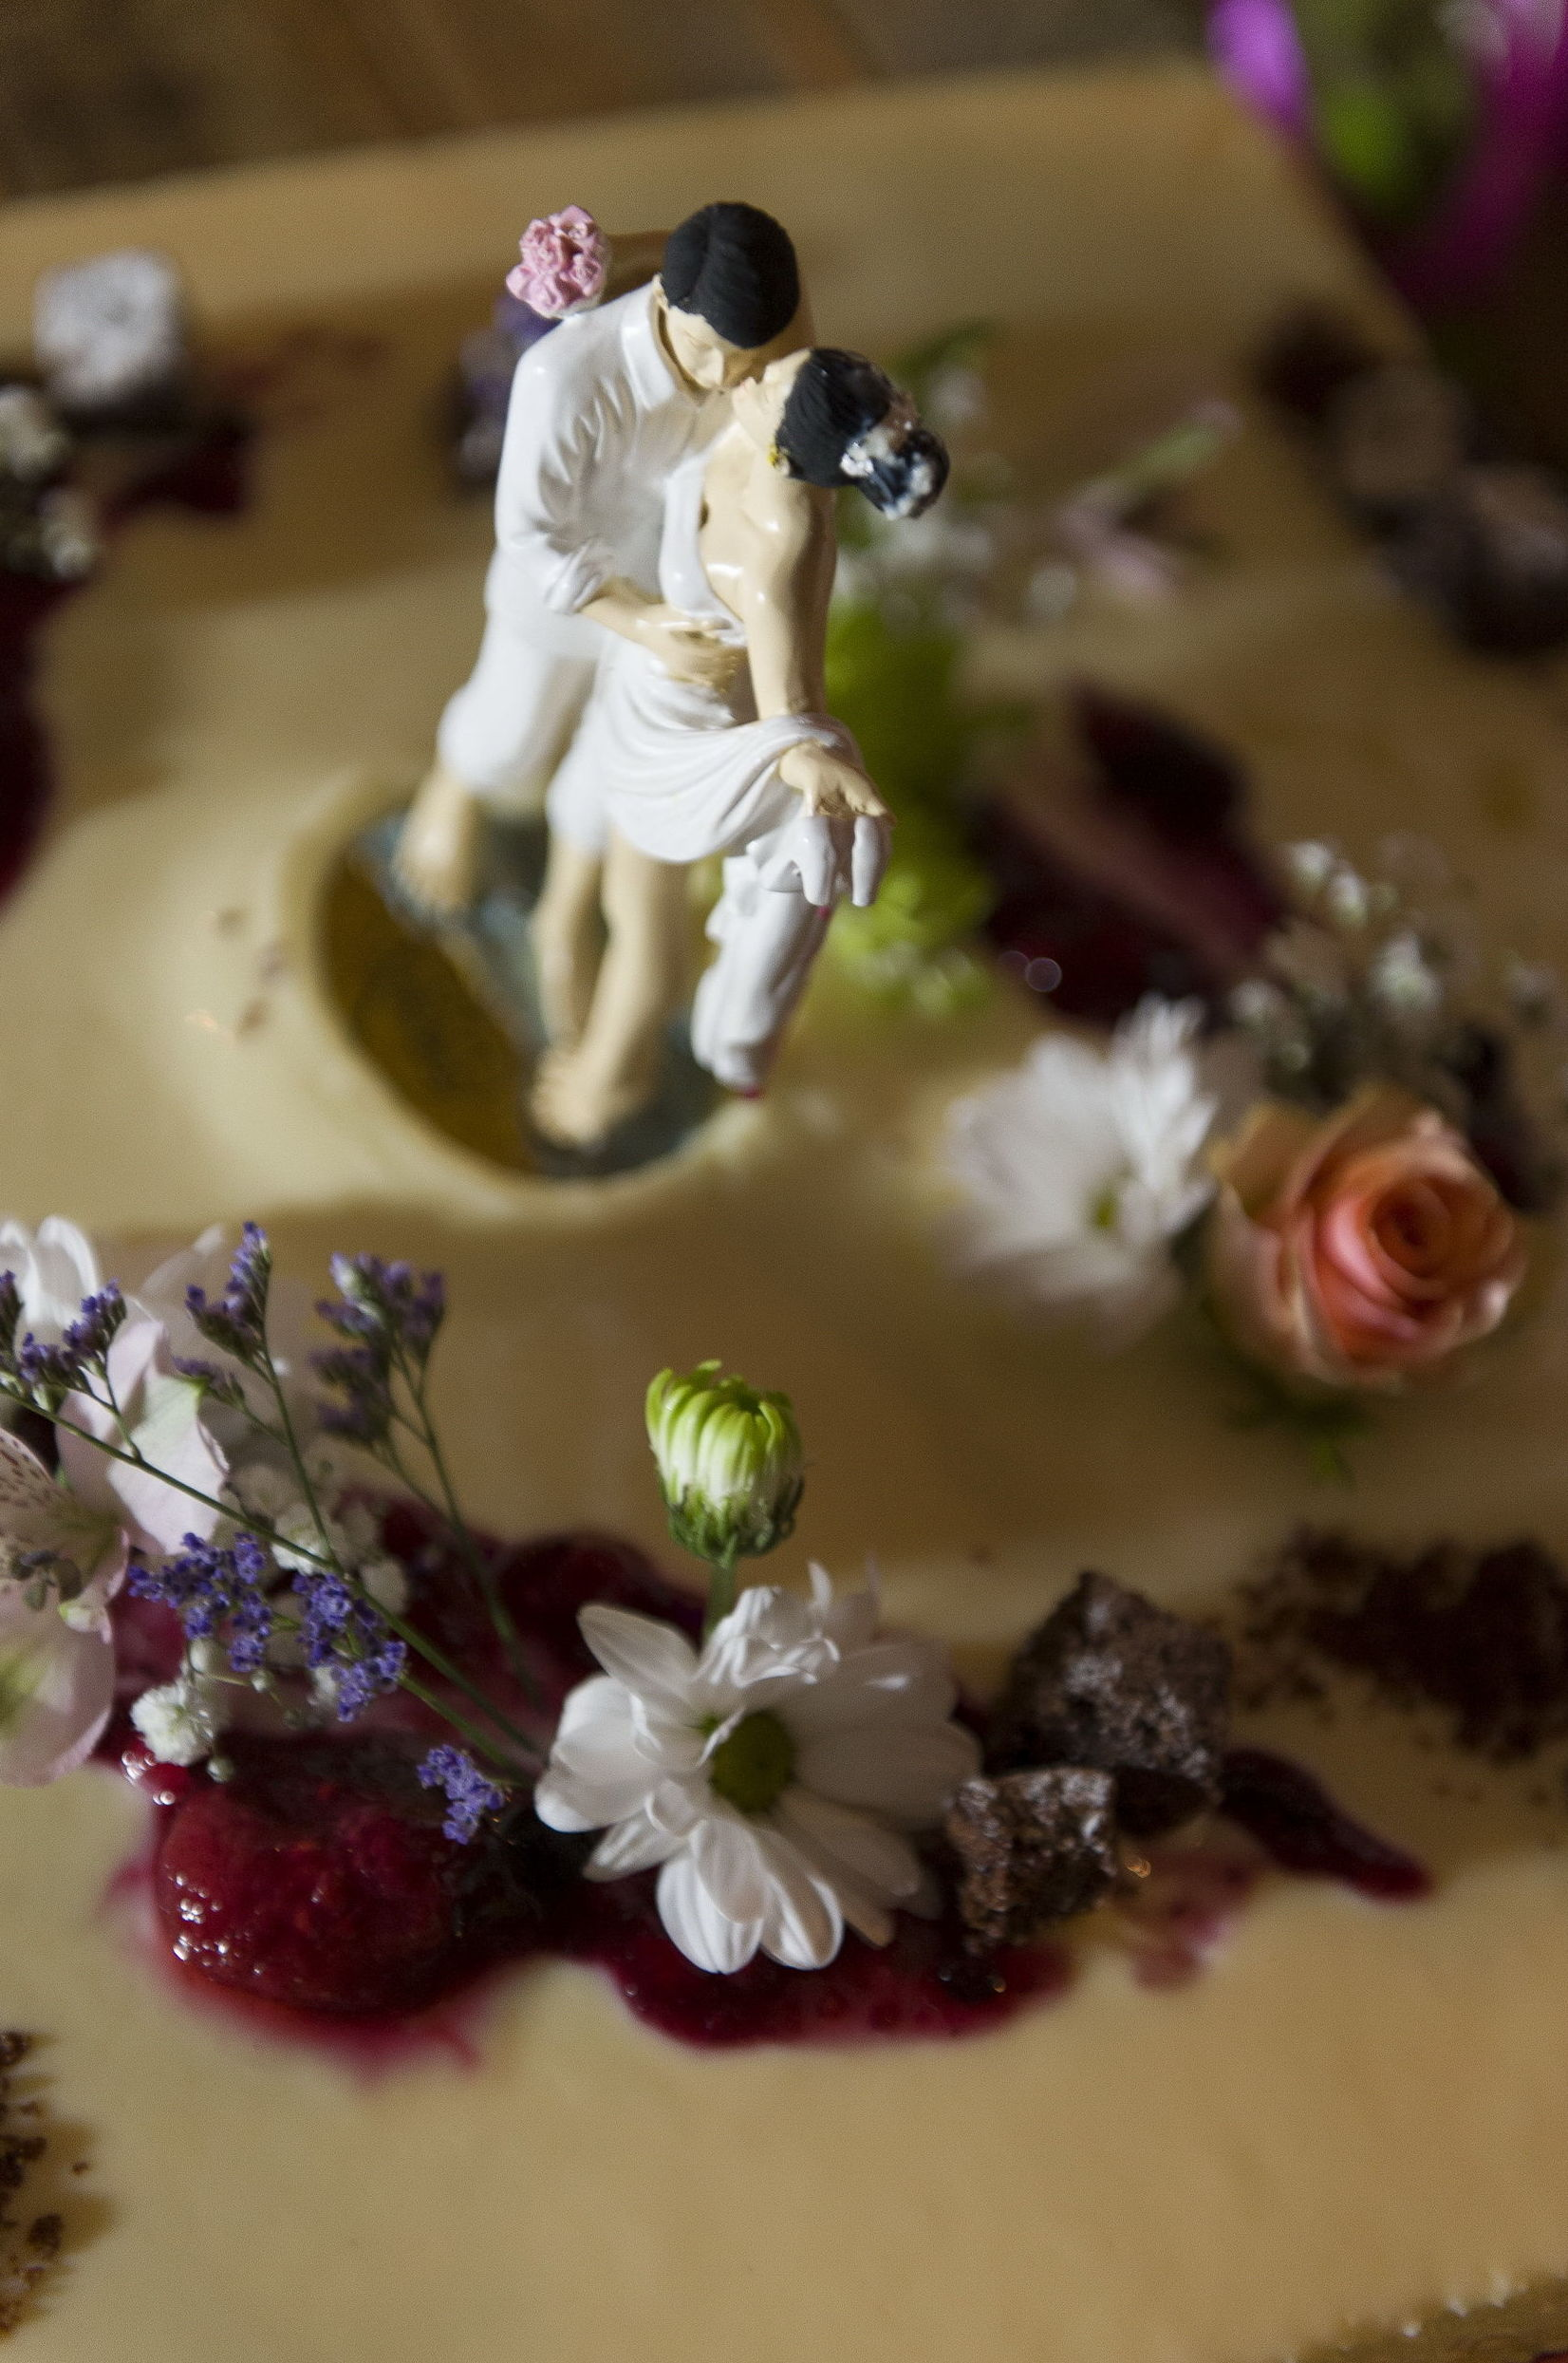 Detalle de los muñecos de la tarta